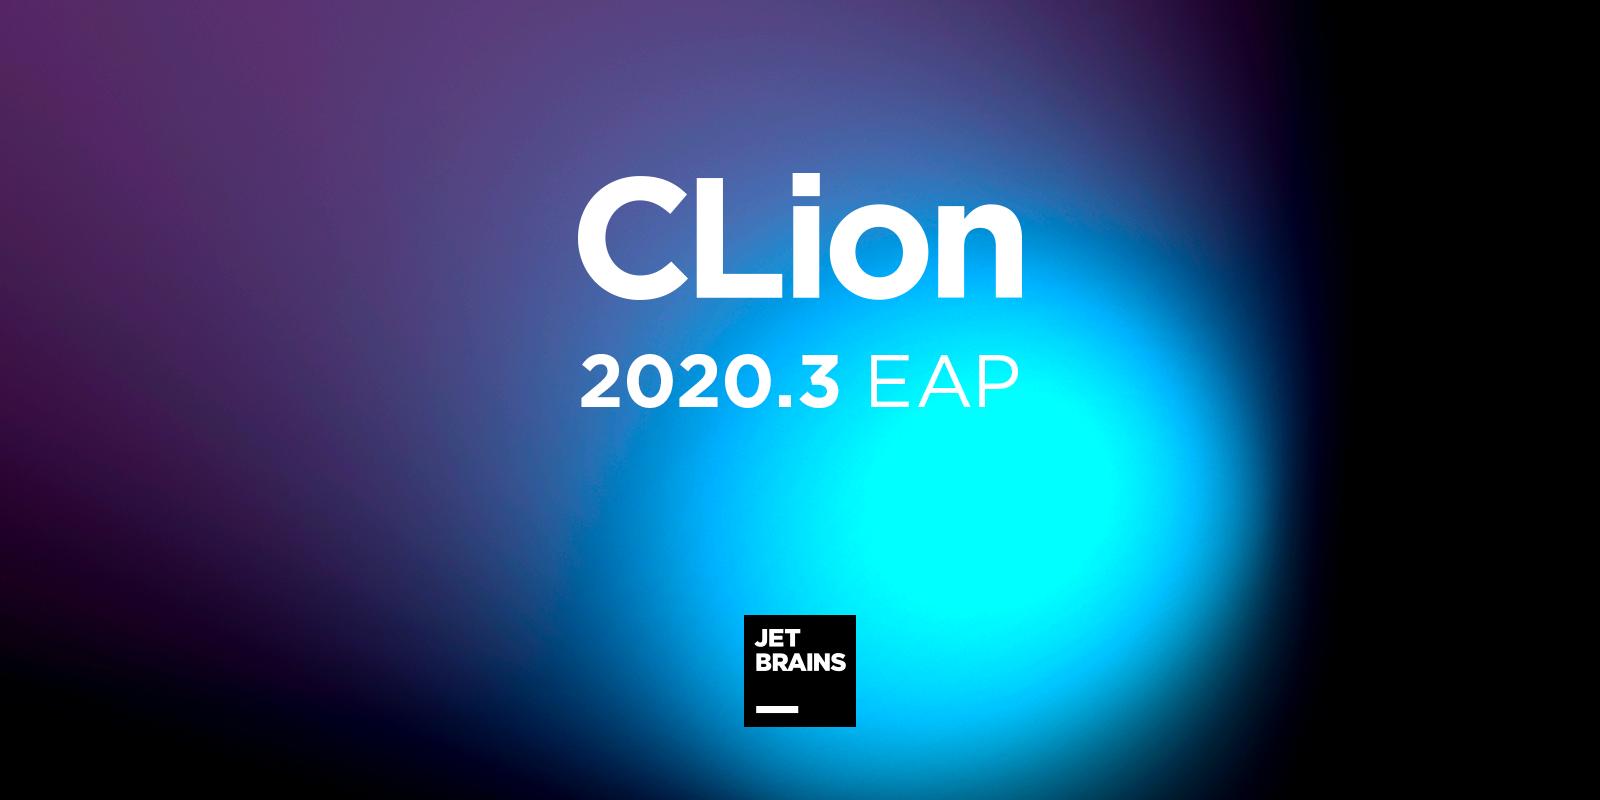 CLion EAP starts